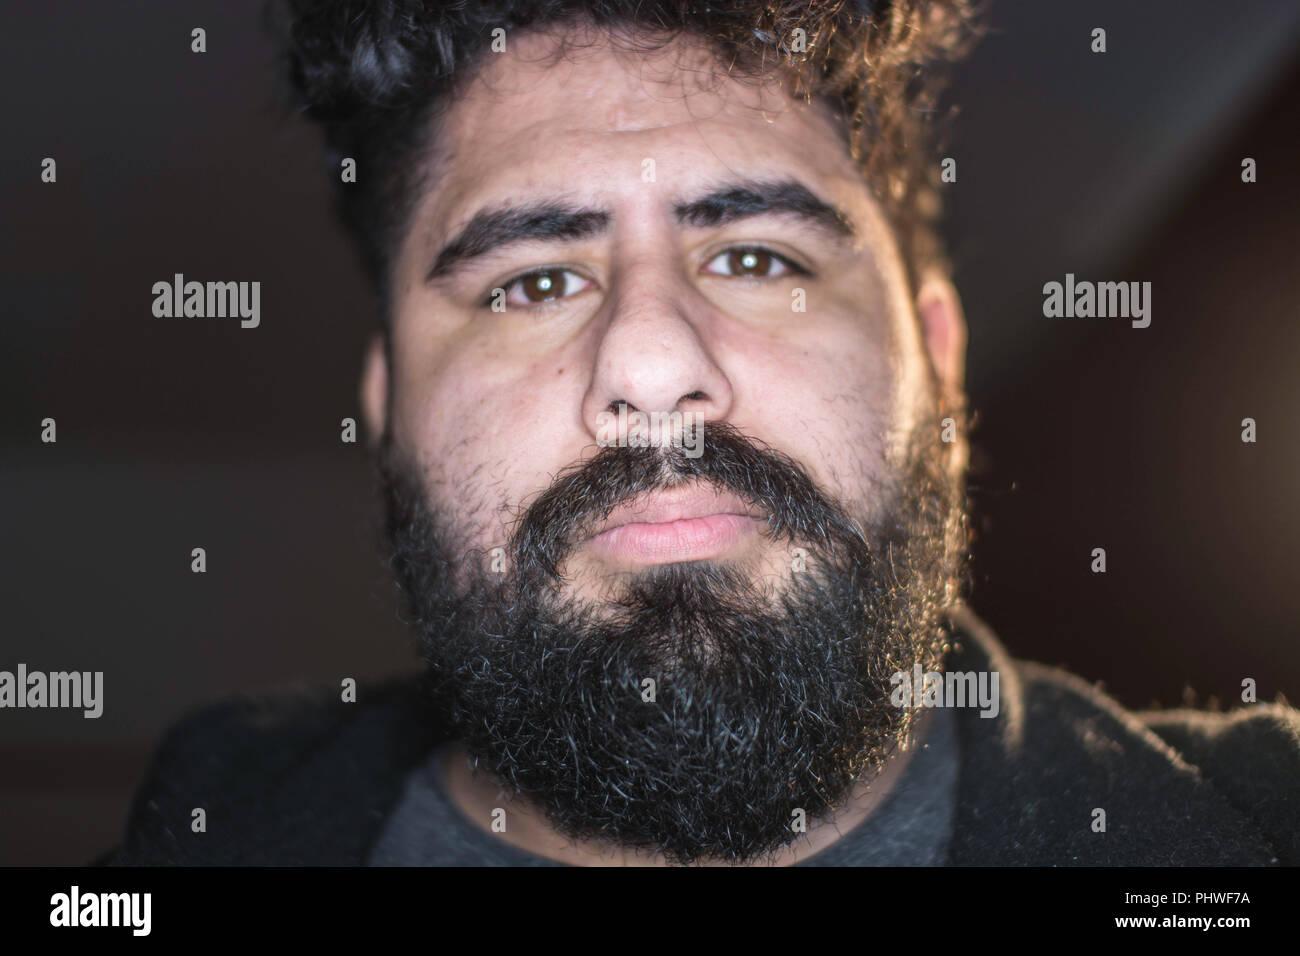 Portrait of hispanic man looking at the camera - Stock Image